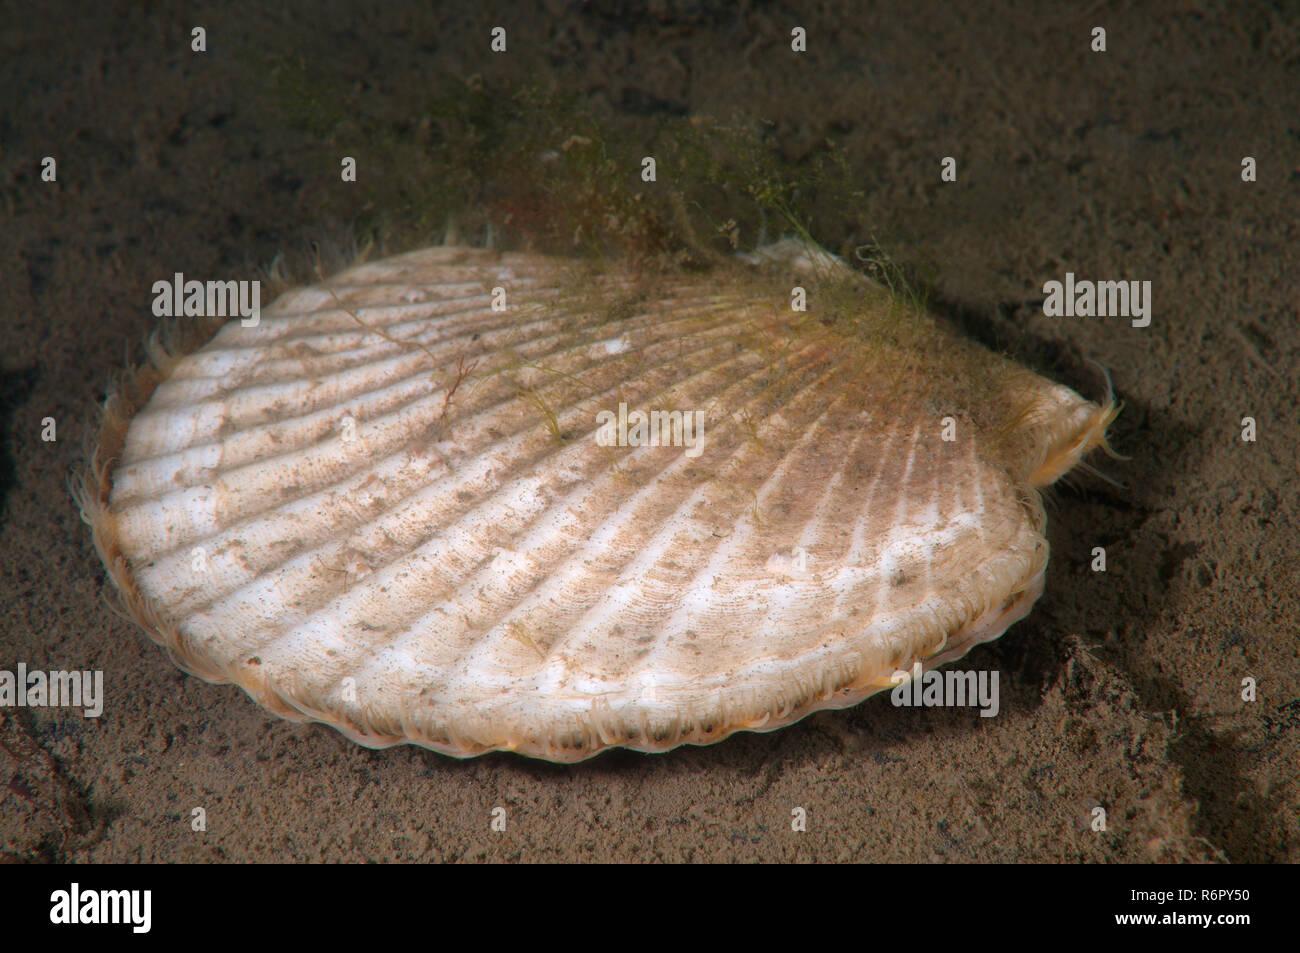 Yesso scallop, Giant Ezo scallop, or Ezo giant scallop (Mizuhopecten yessoensis) Sea of Japan, Rudnaya Pristan, Far East, Primorsky Krai, Russia Stock Photo